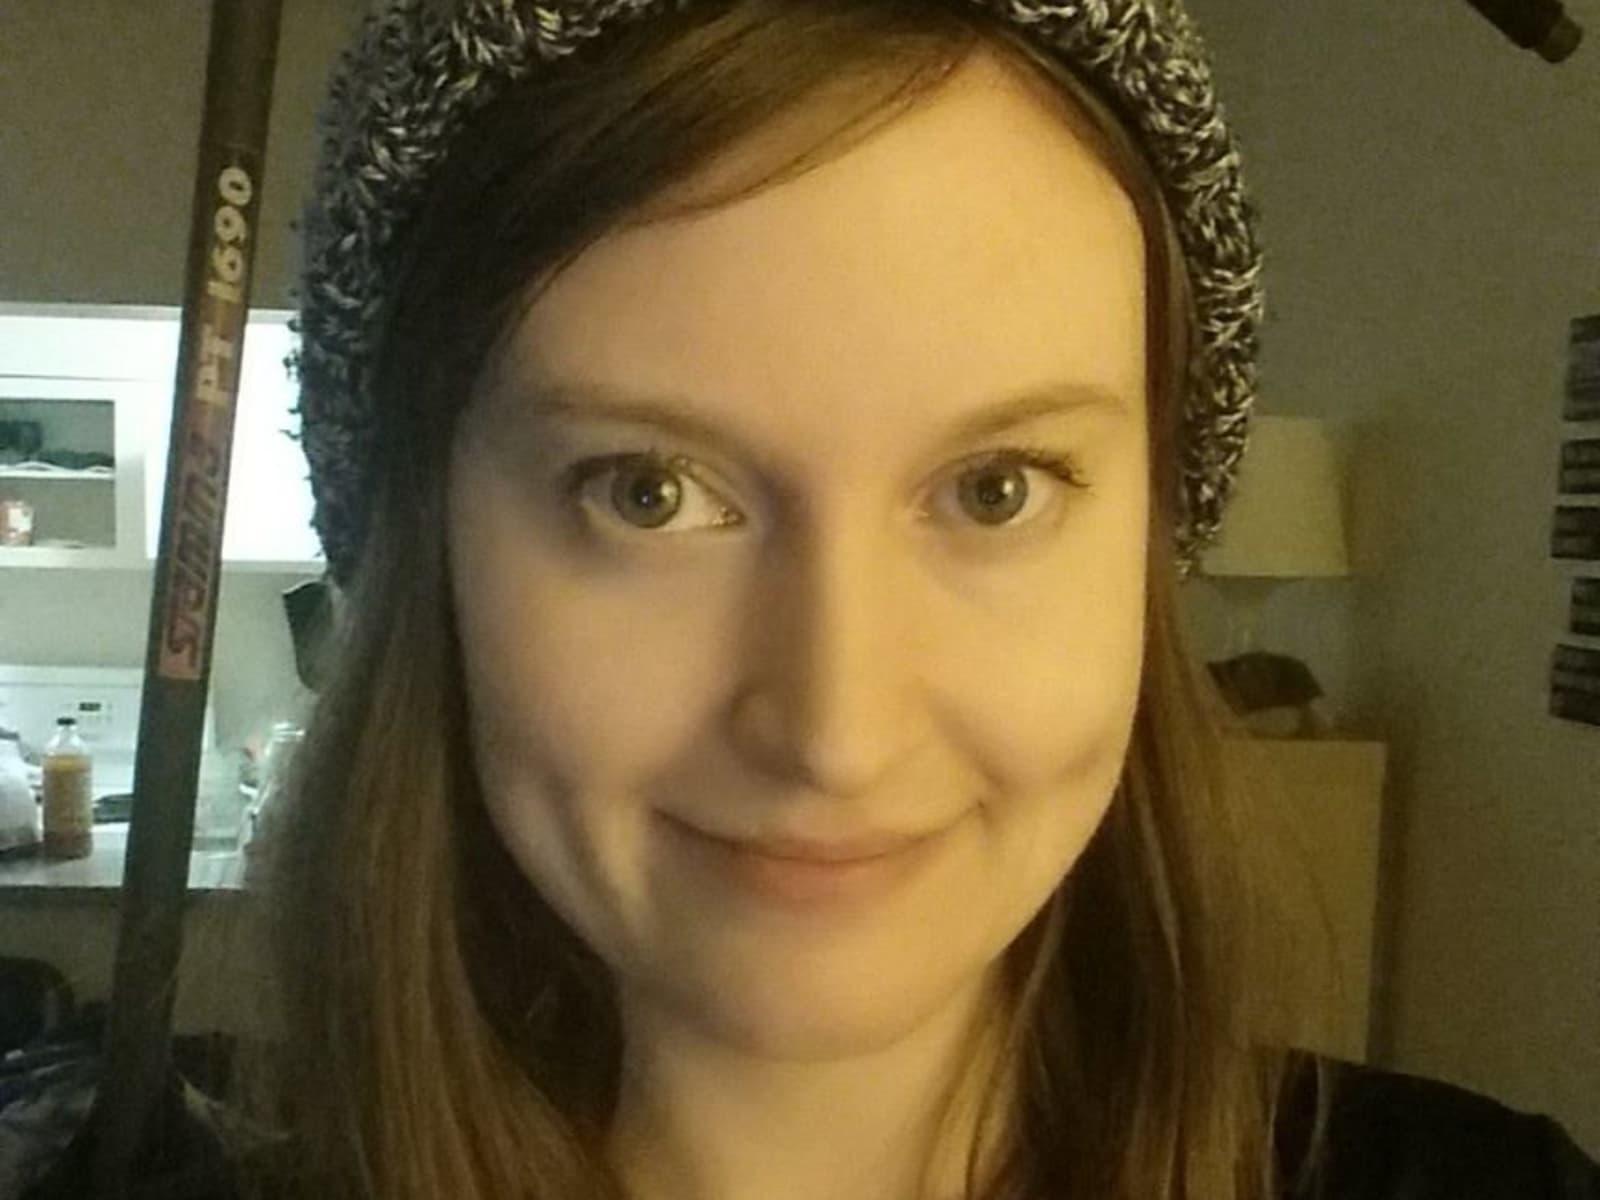 Krista from Ottawa, Ontario, Canada